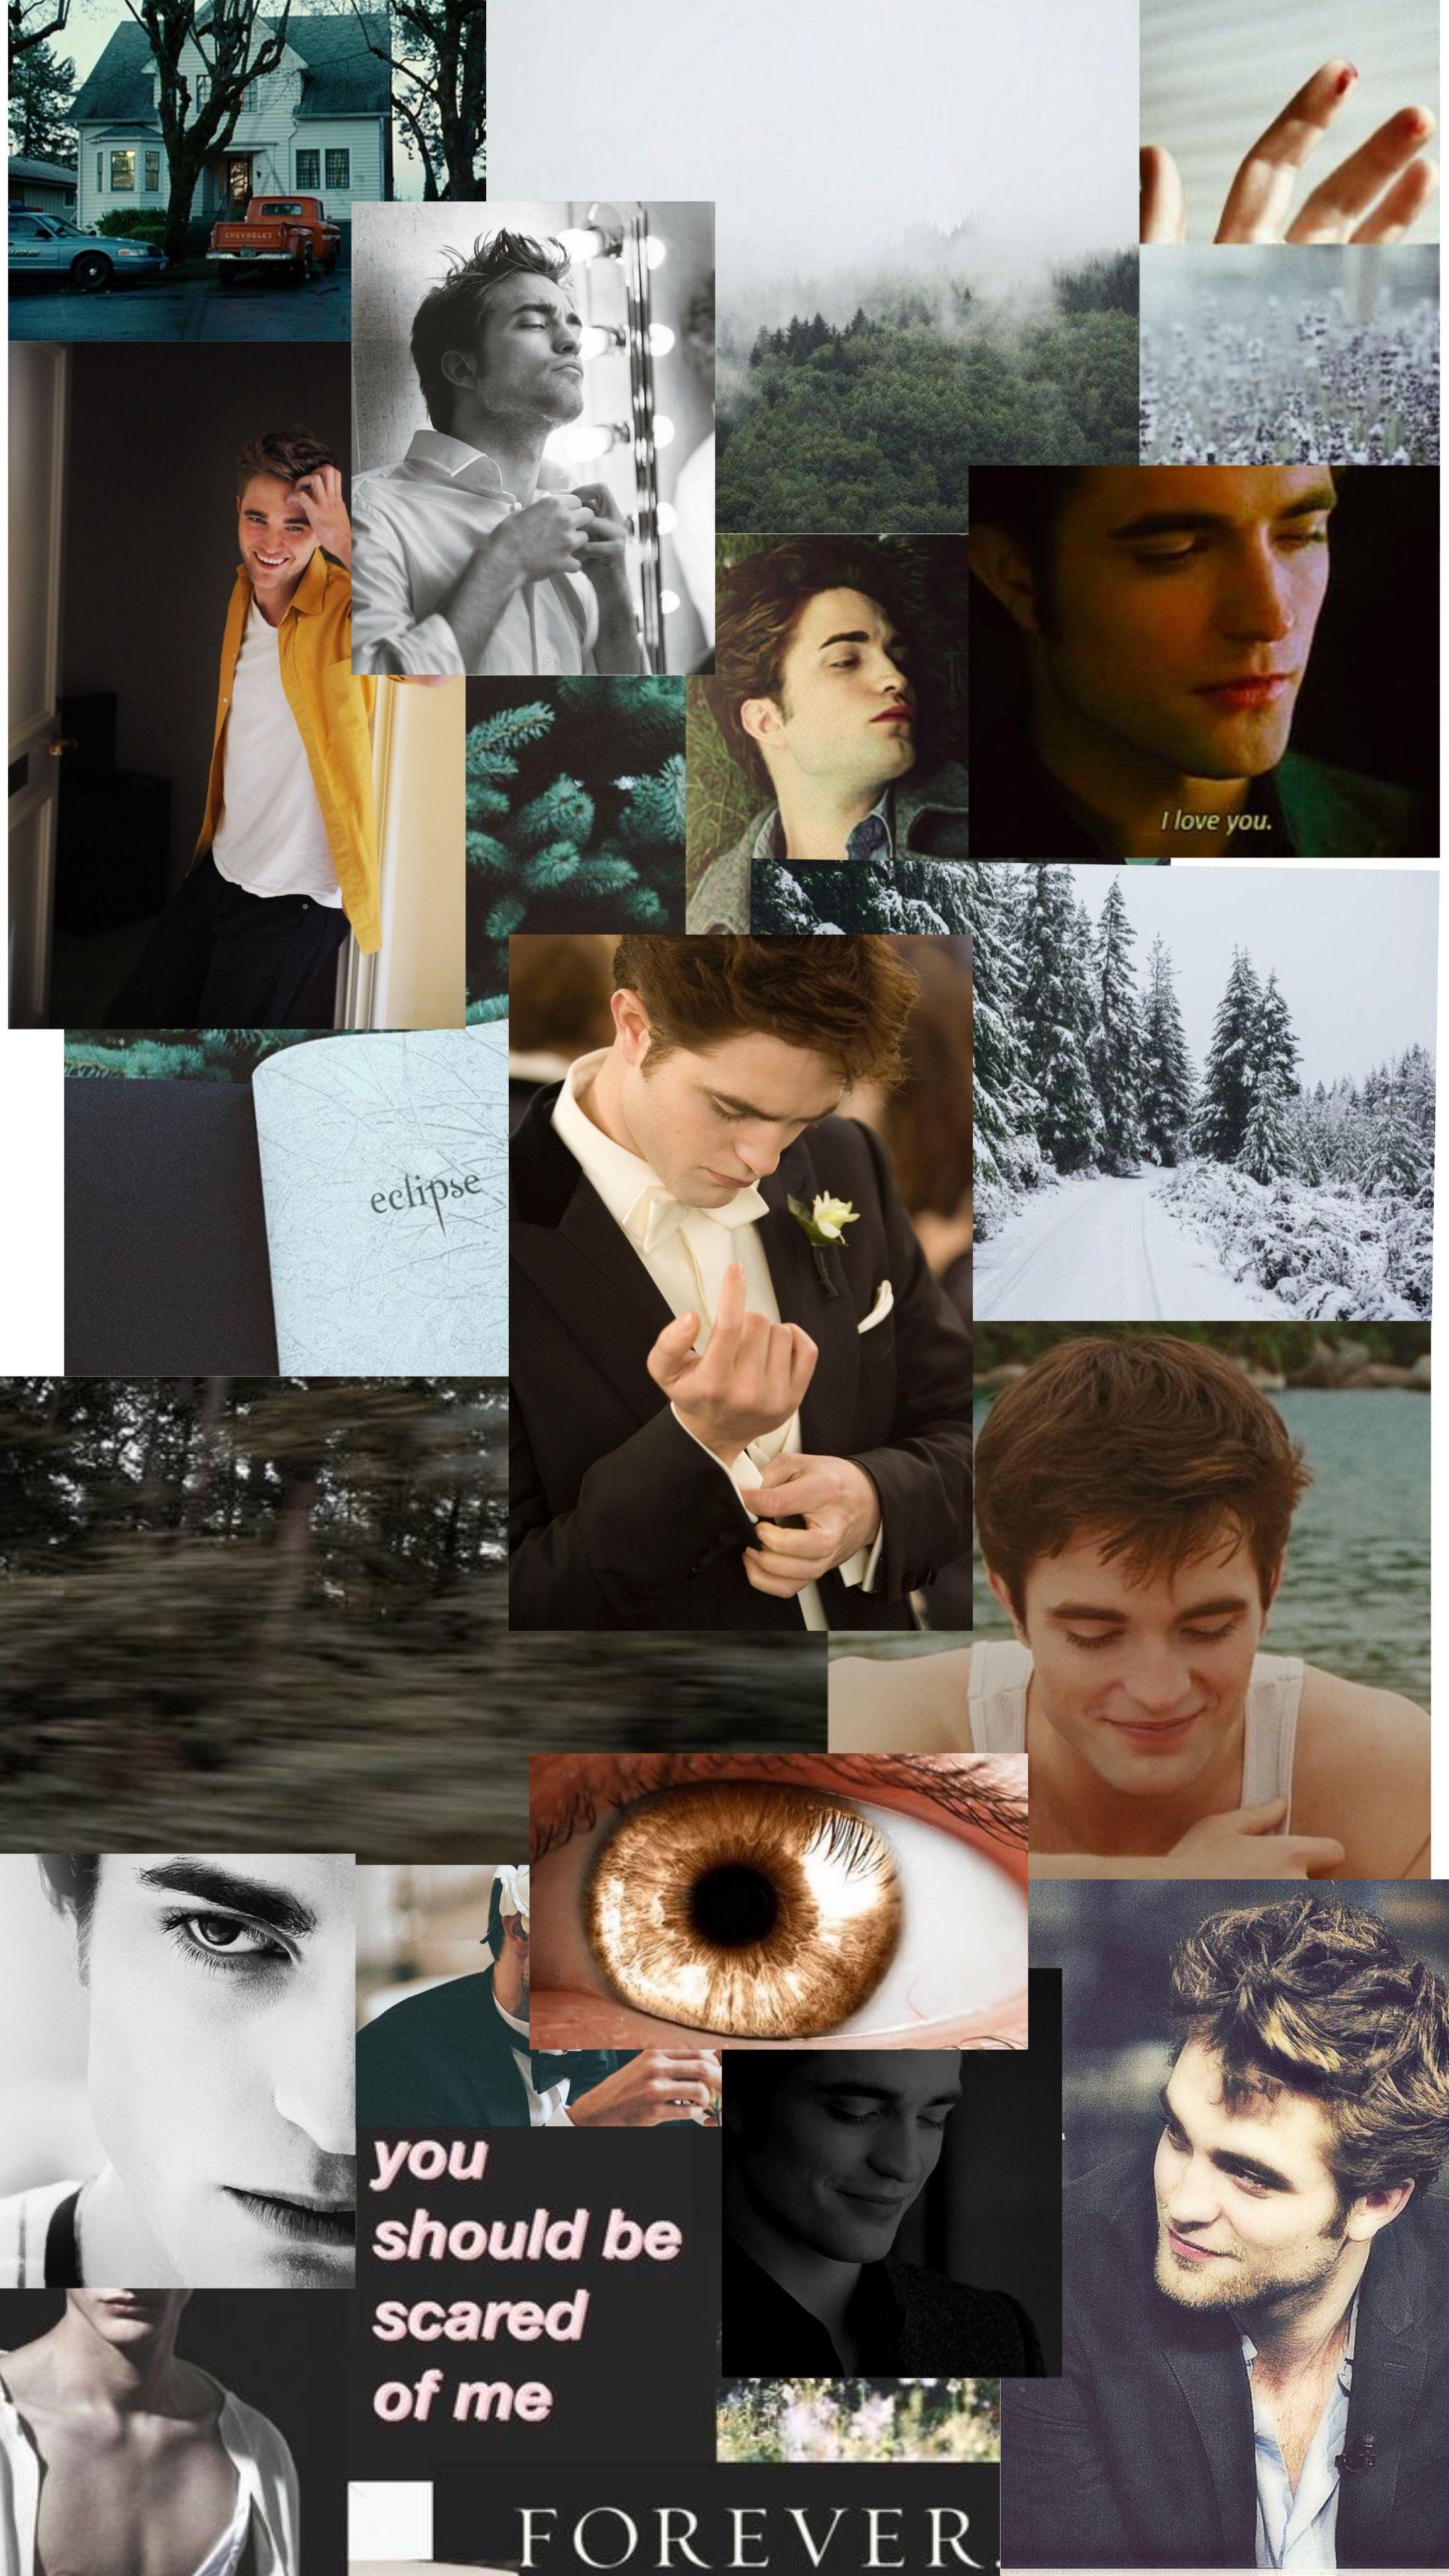 Robert Pattinson Wallpaper Aesthetic Edward Cullen Twilight Twilight Edward Robert Pattinson Twilight Twilight Film